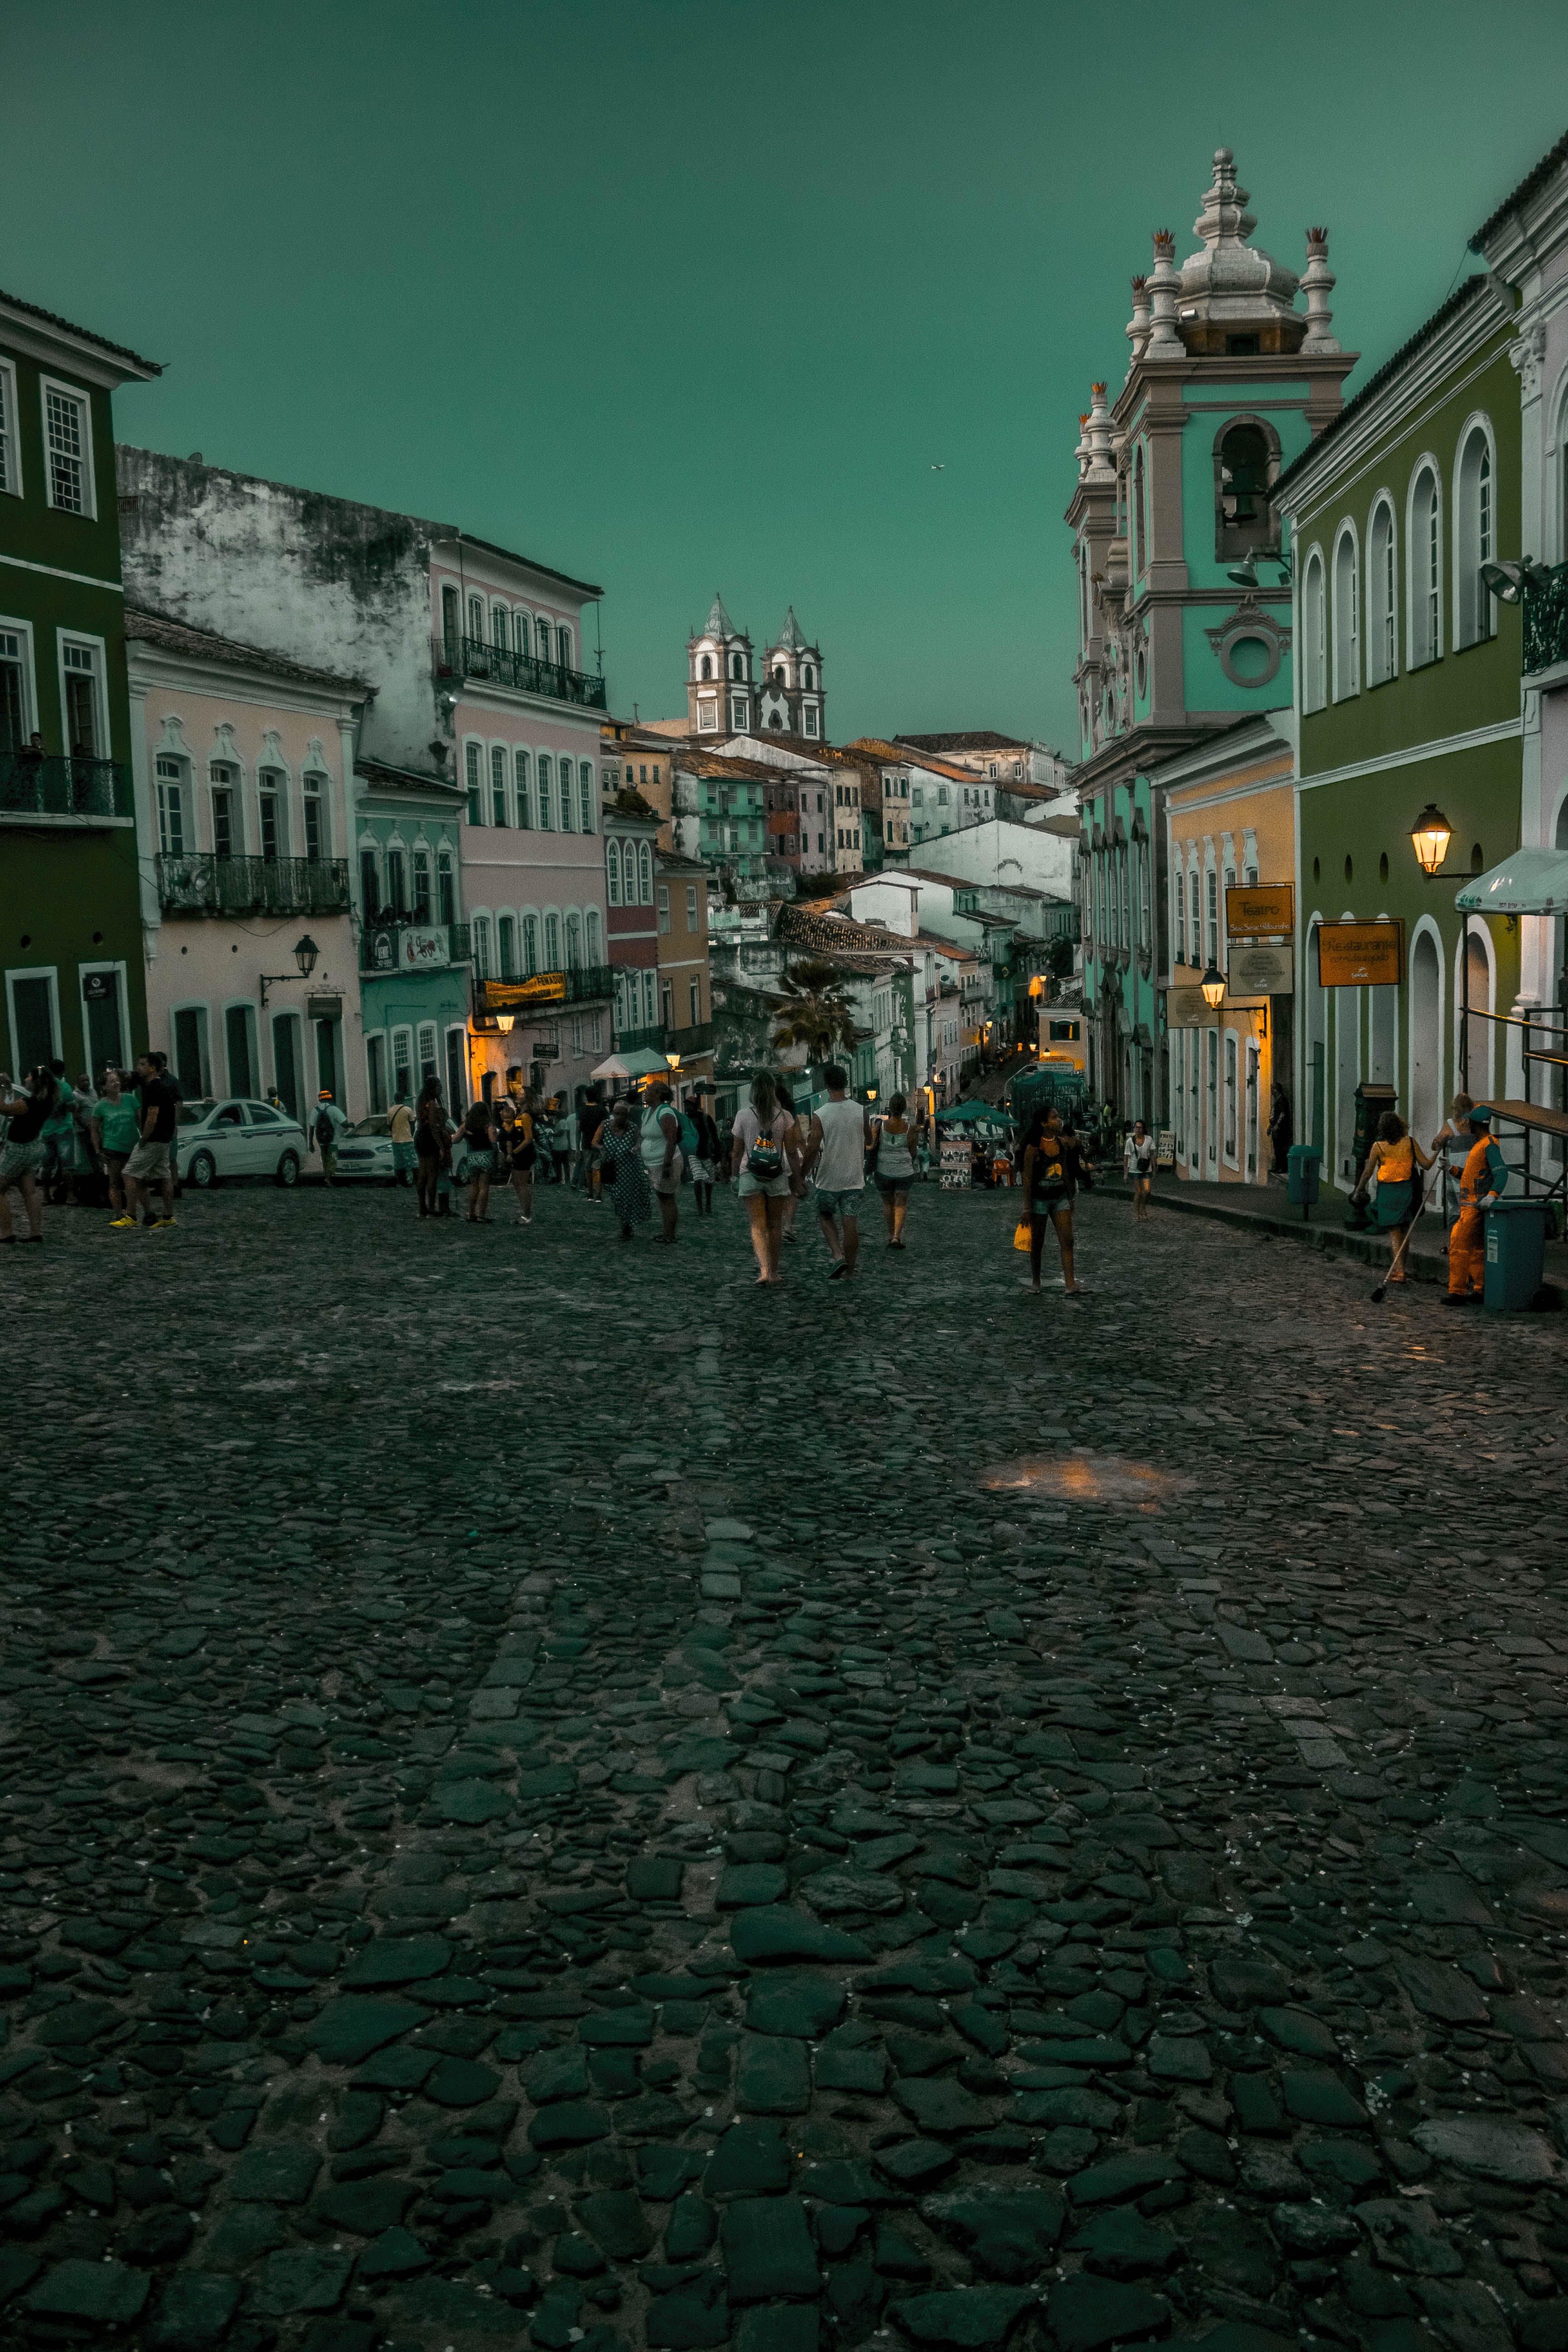 Free stock photo of city, historical, old, tourist destination